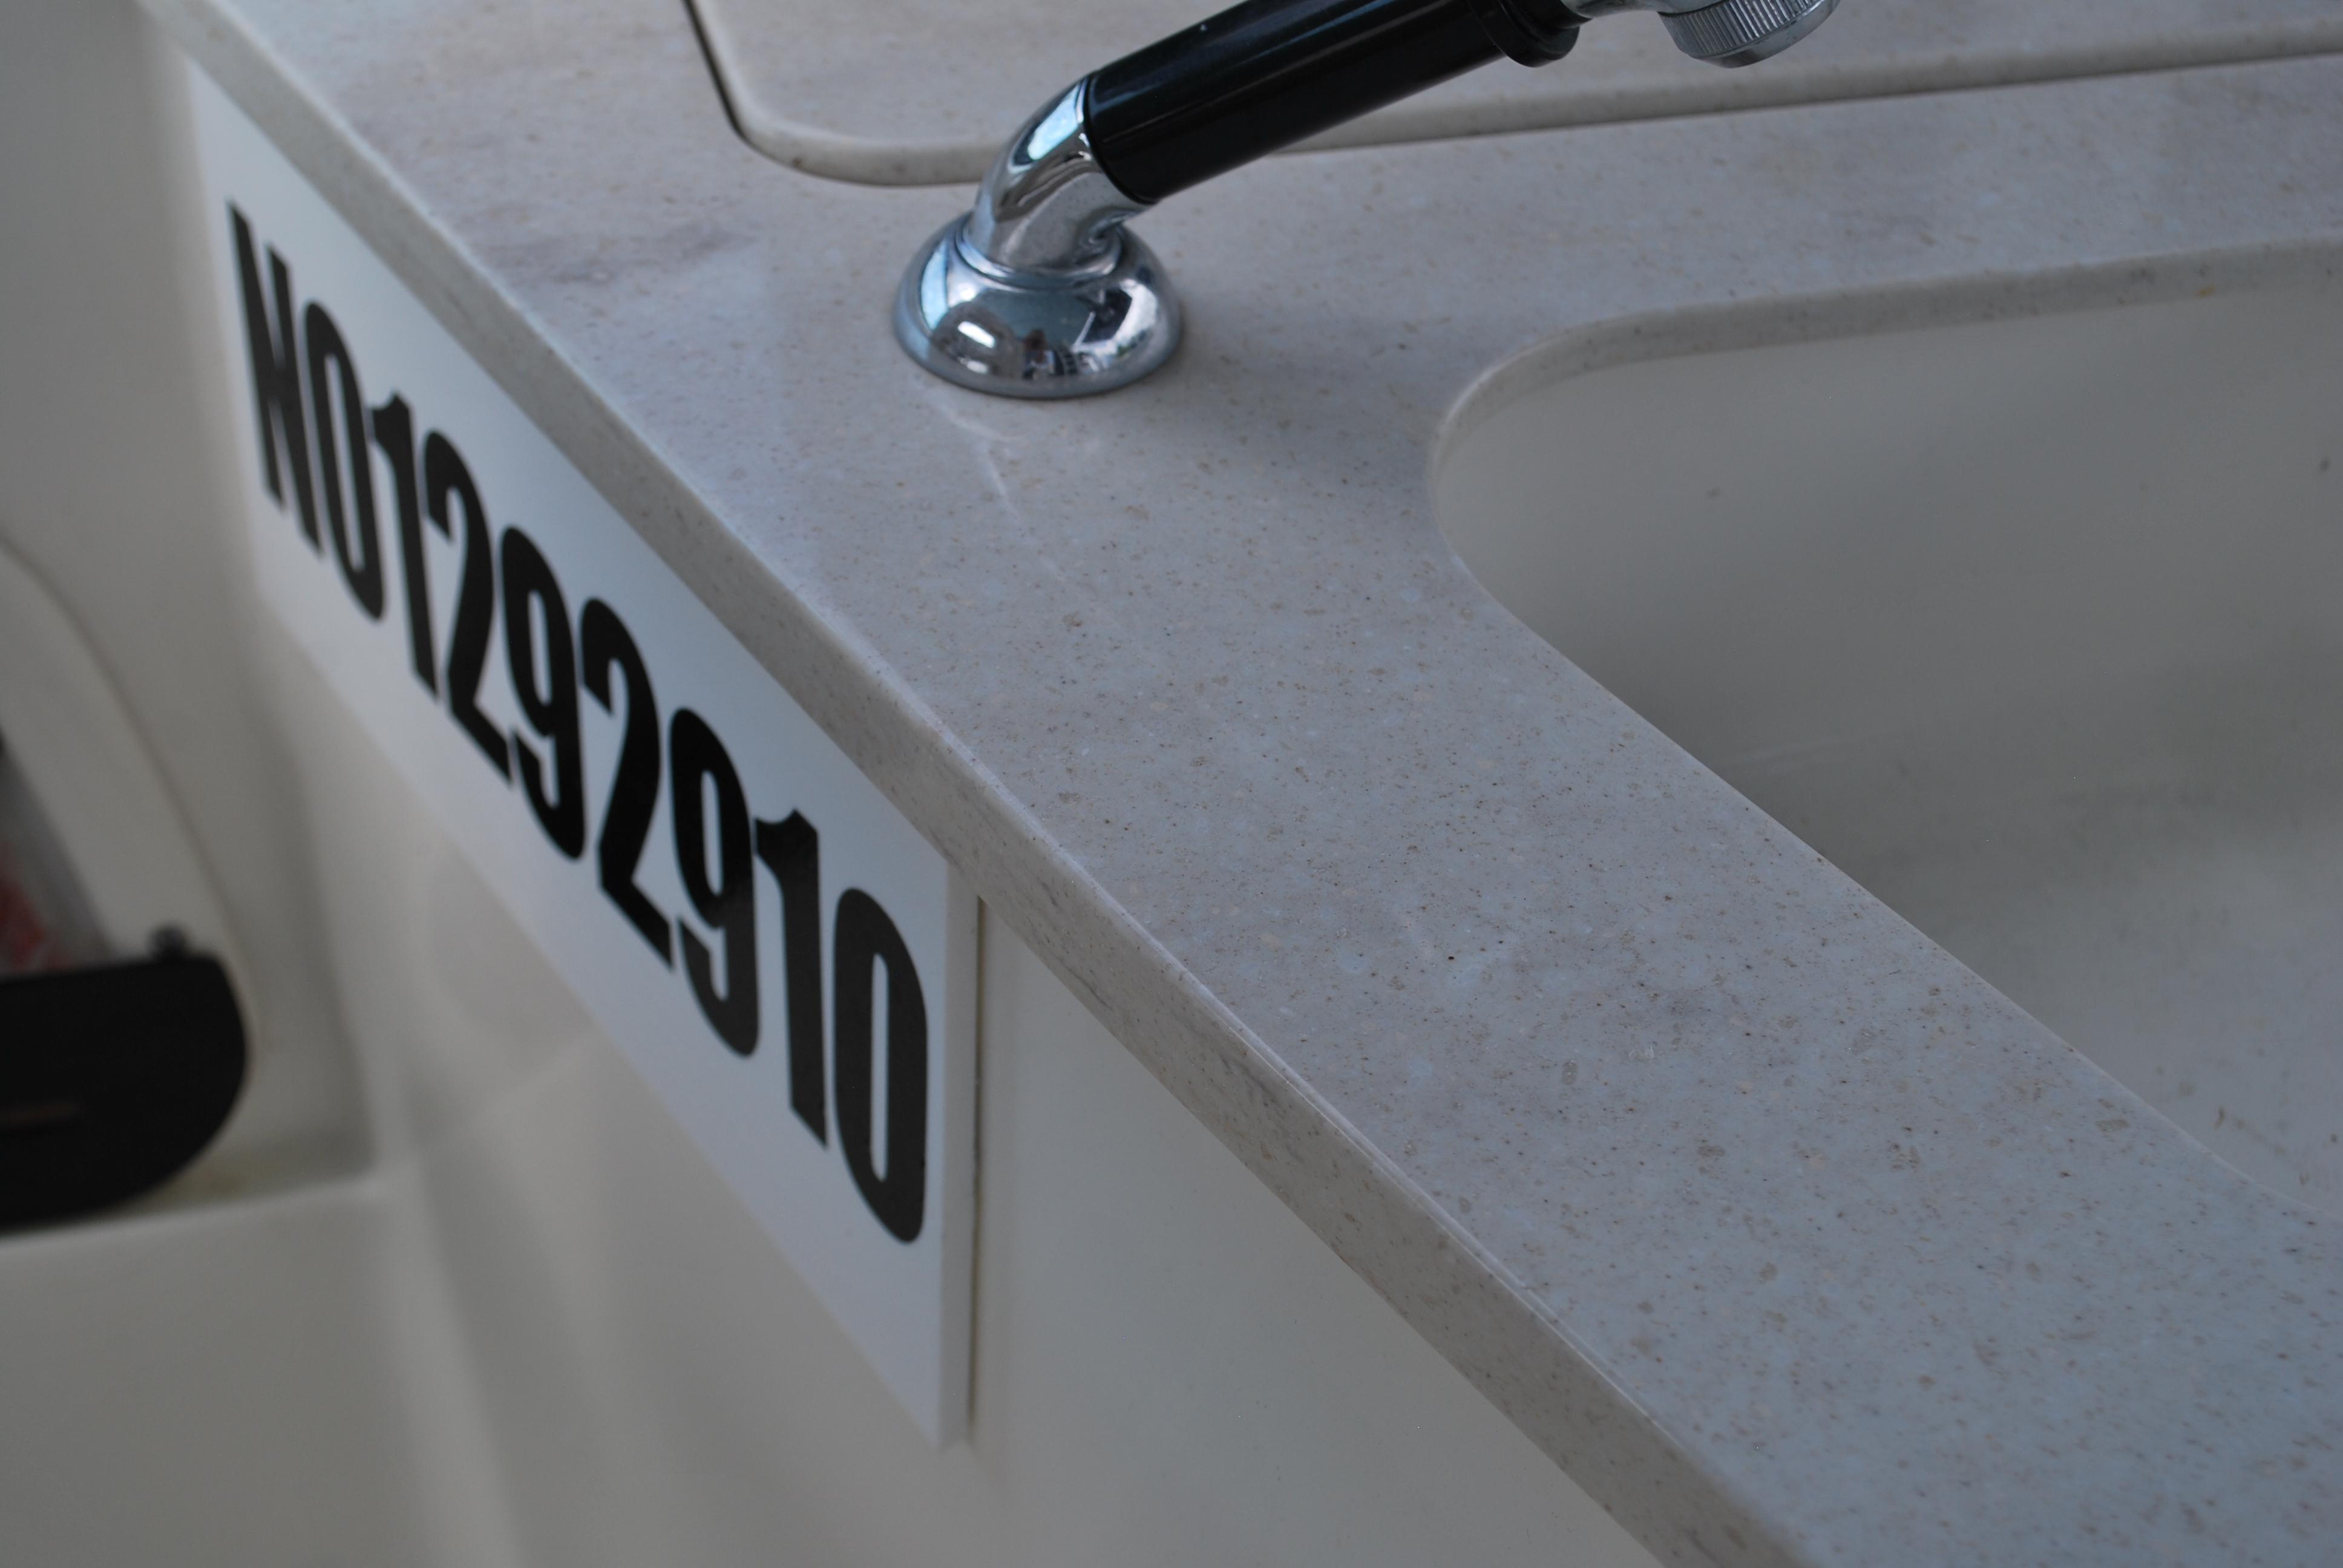 2018 Boston Whaler Vantage 270